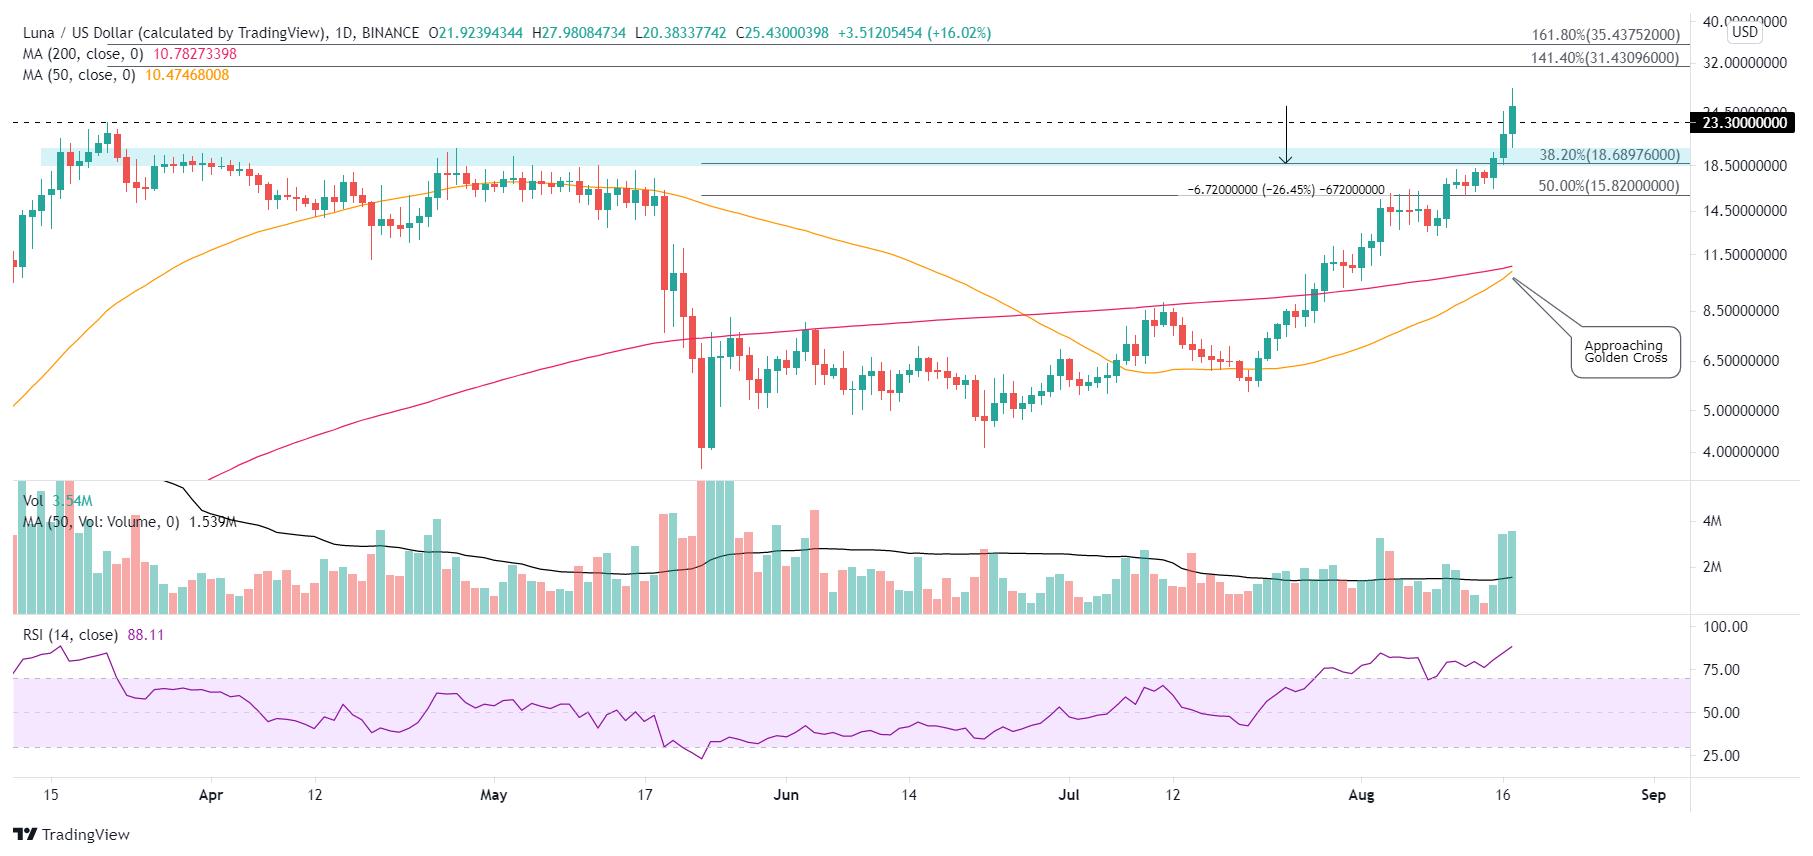 LUNA/USD daily chart